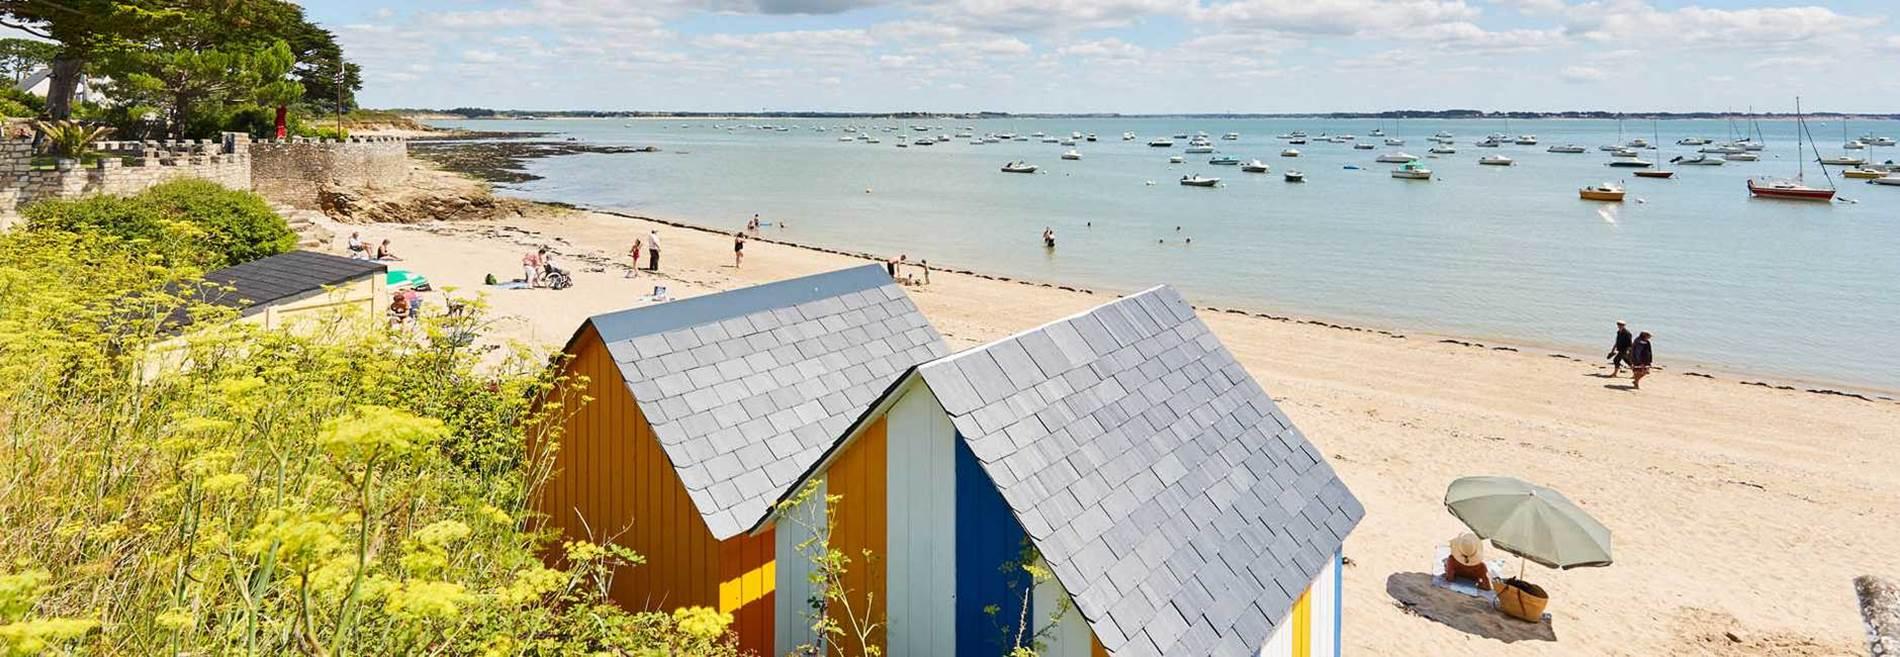 Petite plage de Kervoyal Damgan Morbihan © © A. Lamoureux